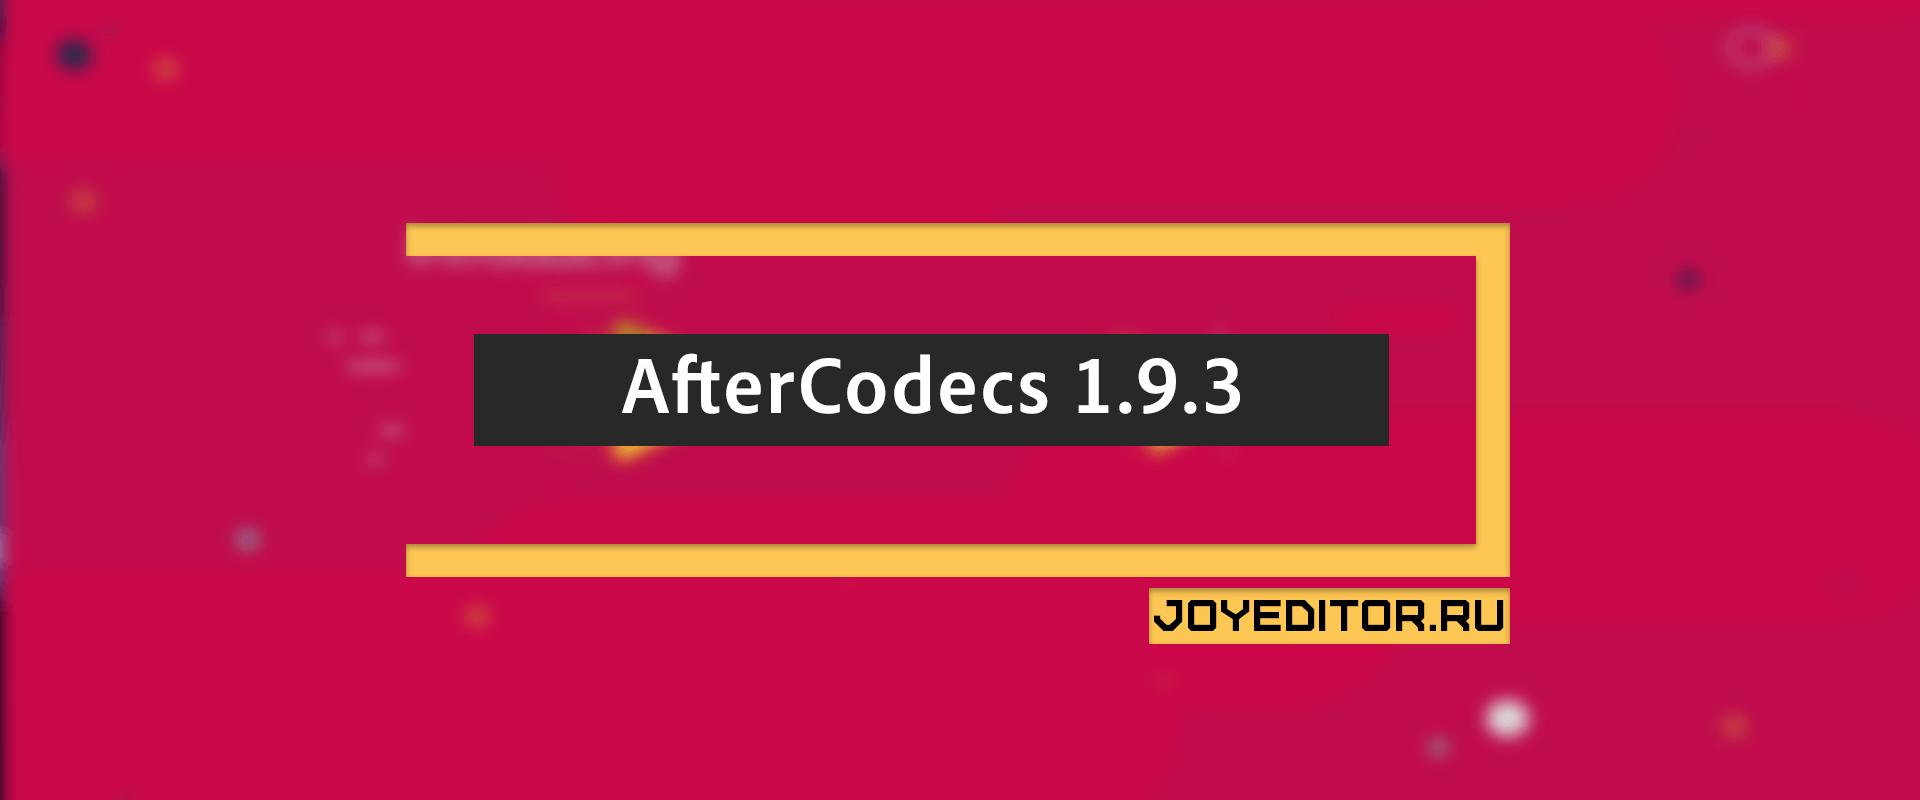 AfterCodecs 1.9.3